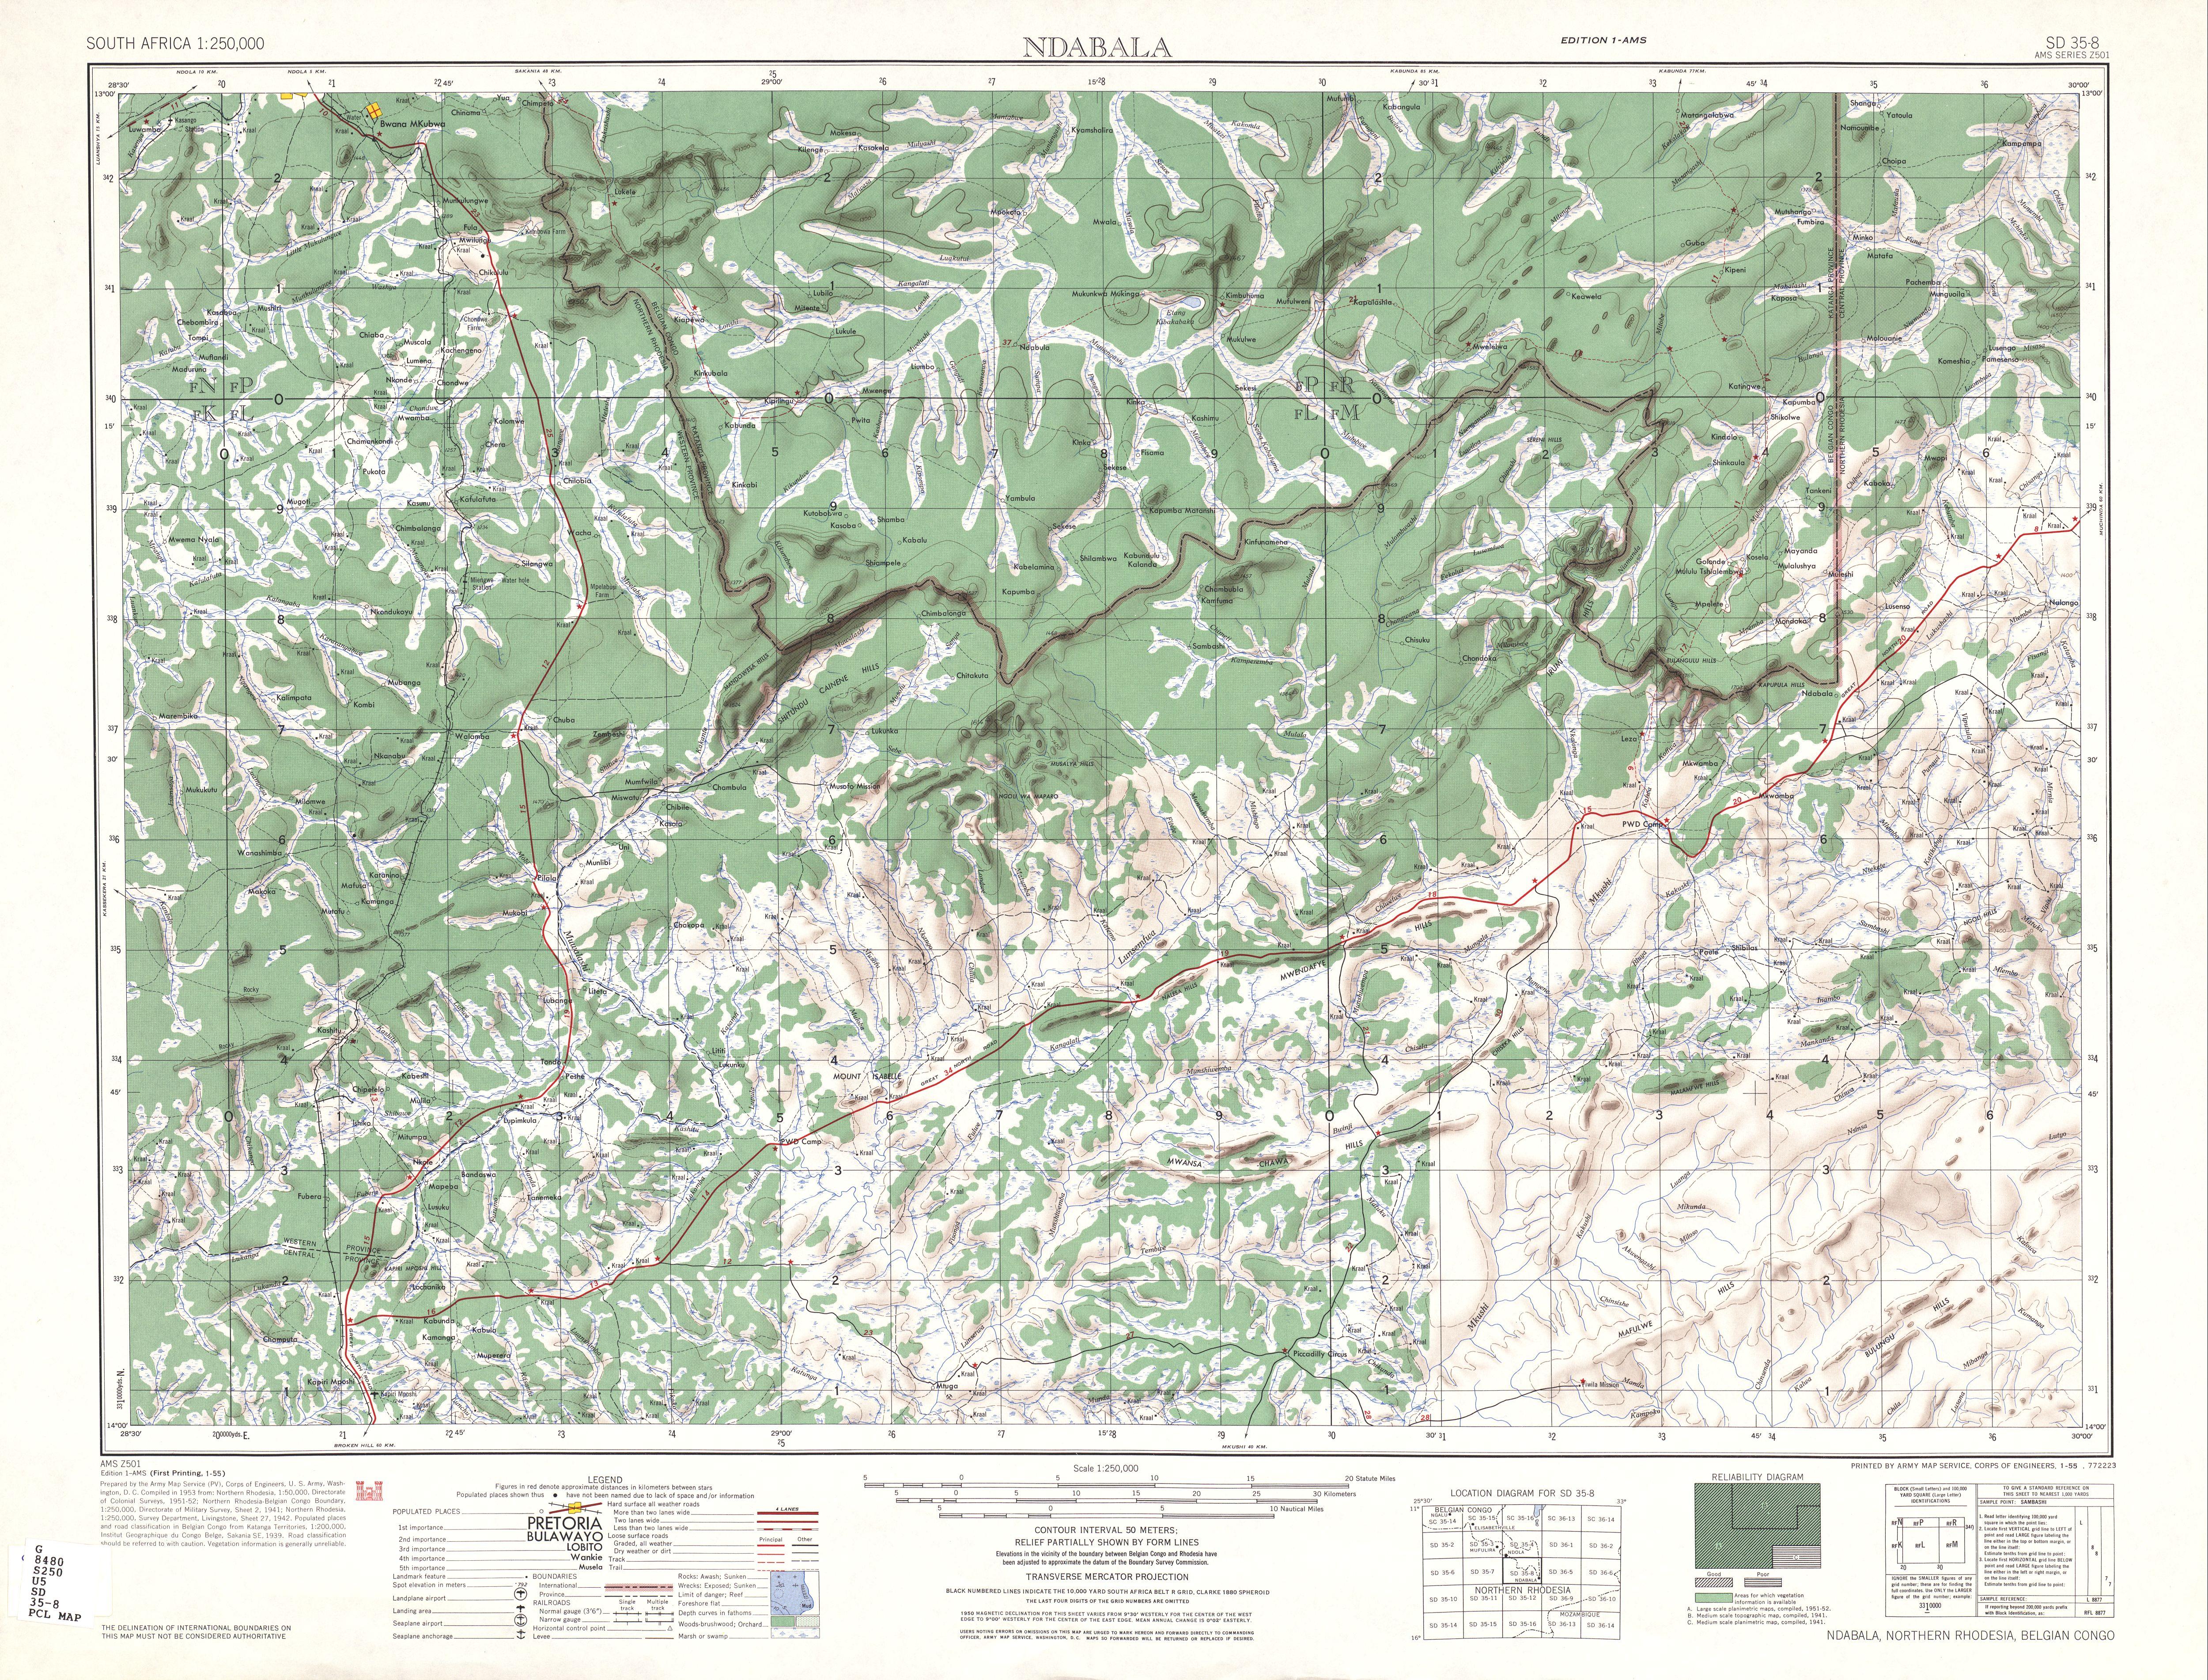 Hoja Ndabala del Mapa Topográfico de África Meridional 1954